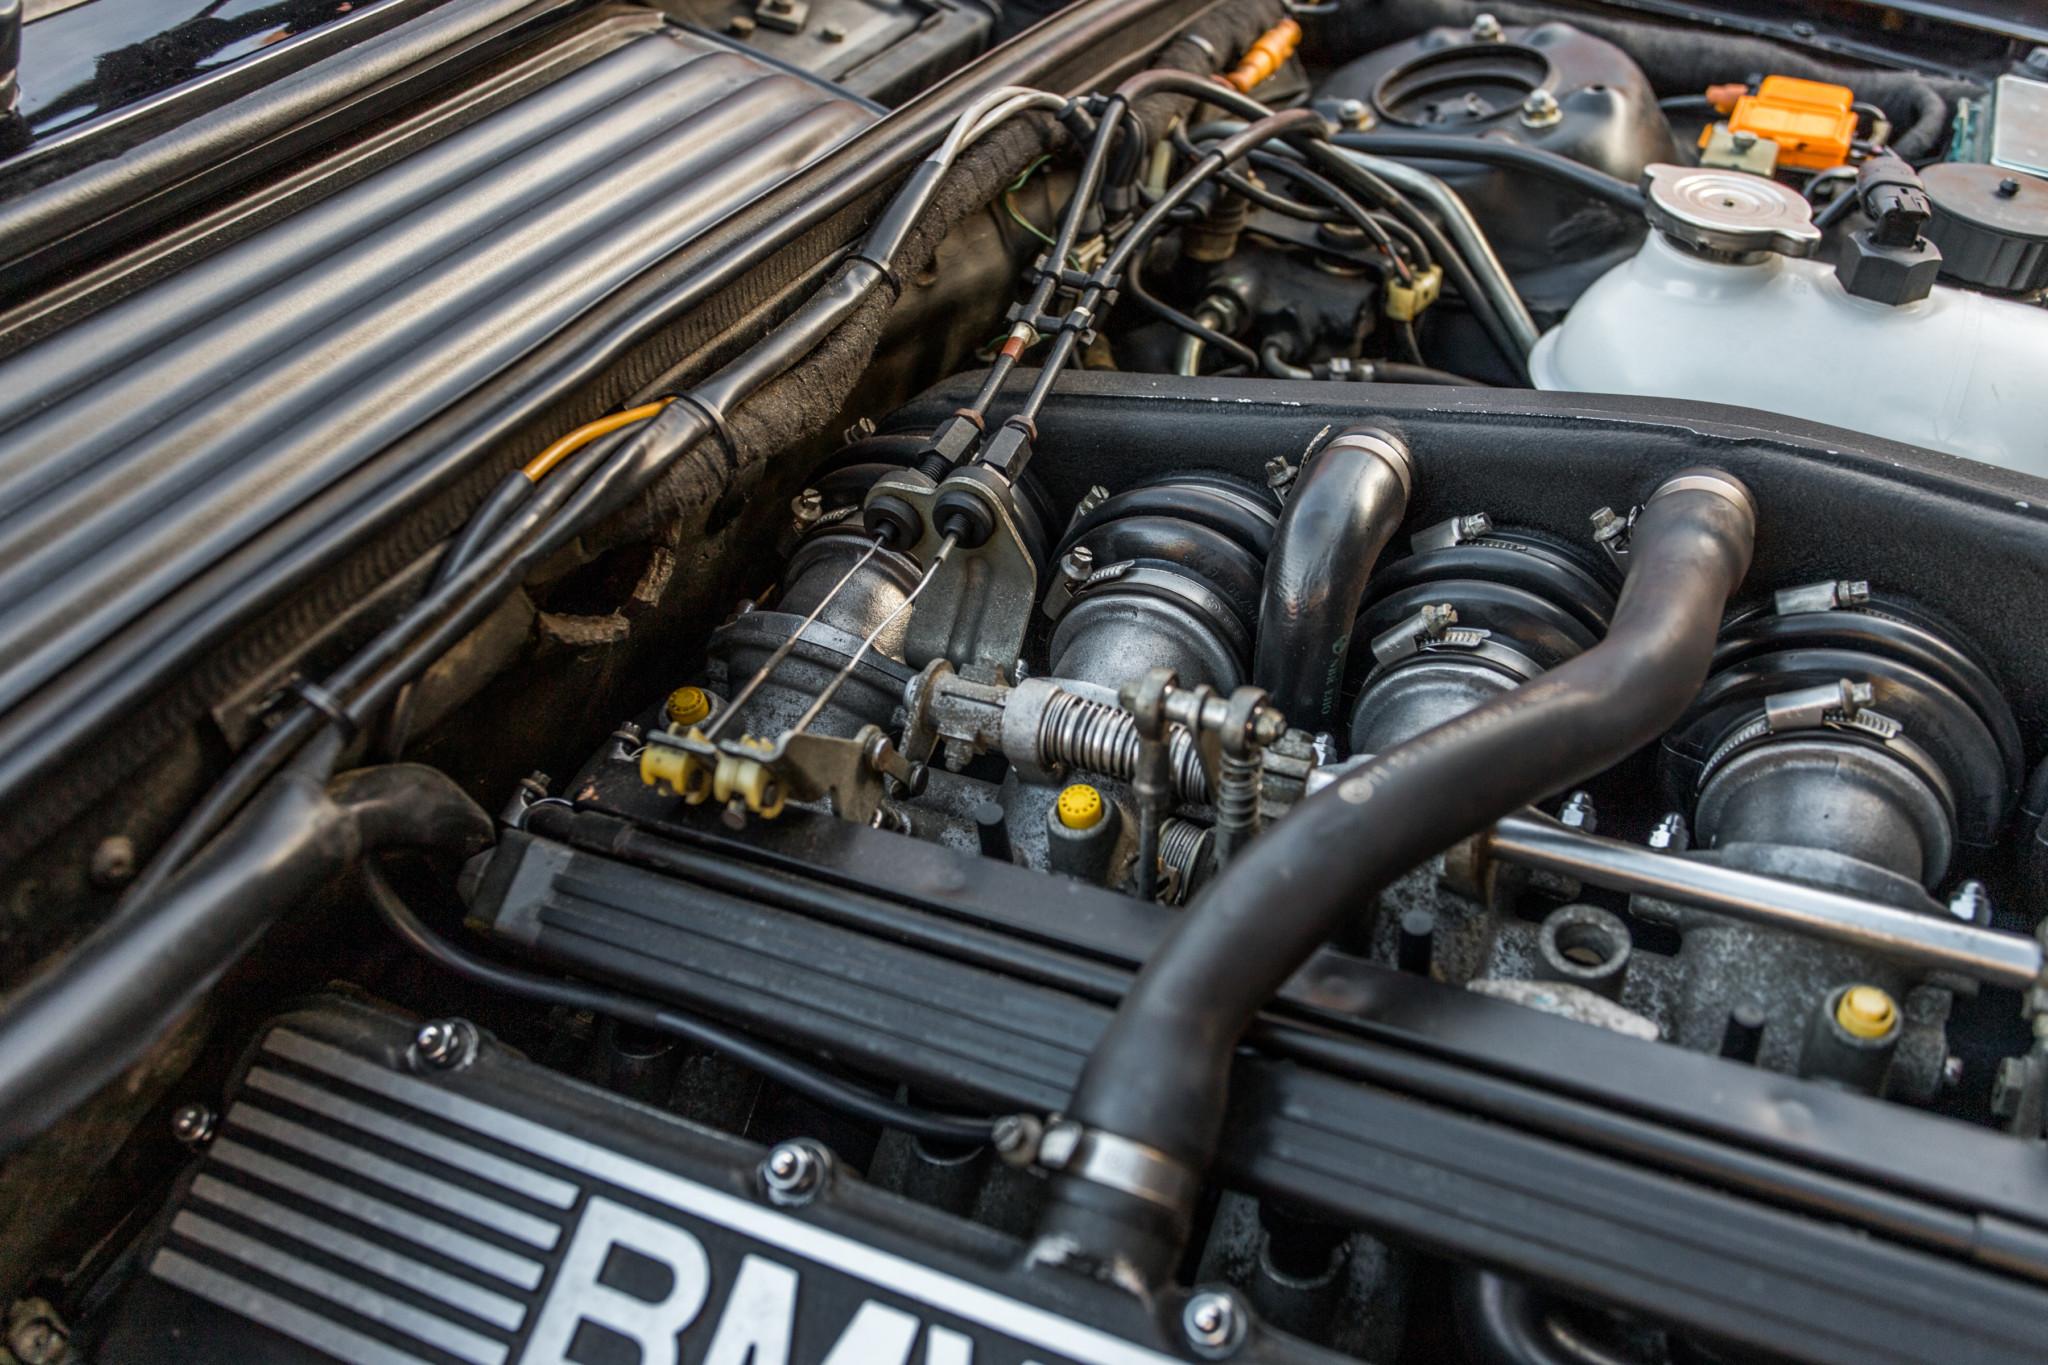 1988 bmw M6 kent classic cars (85).jpg